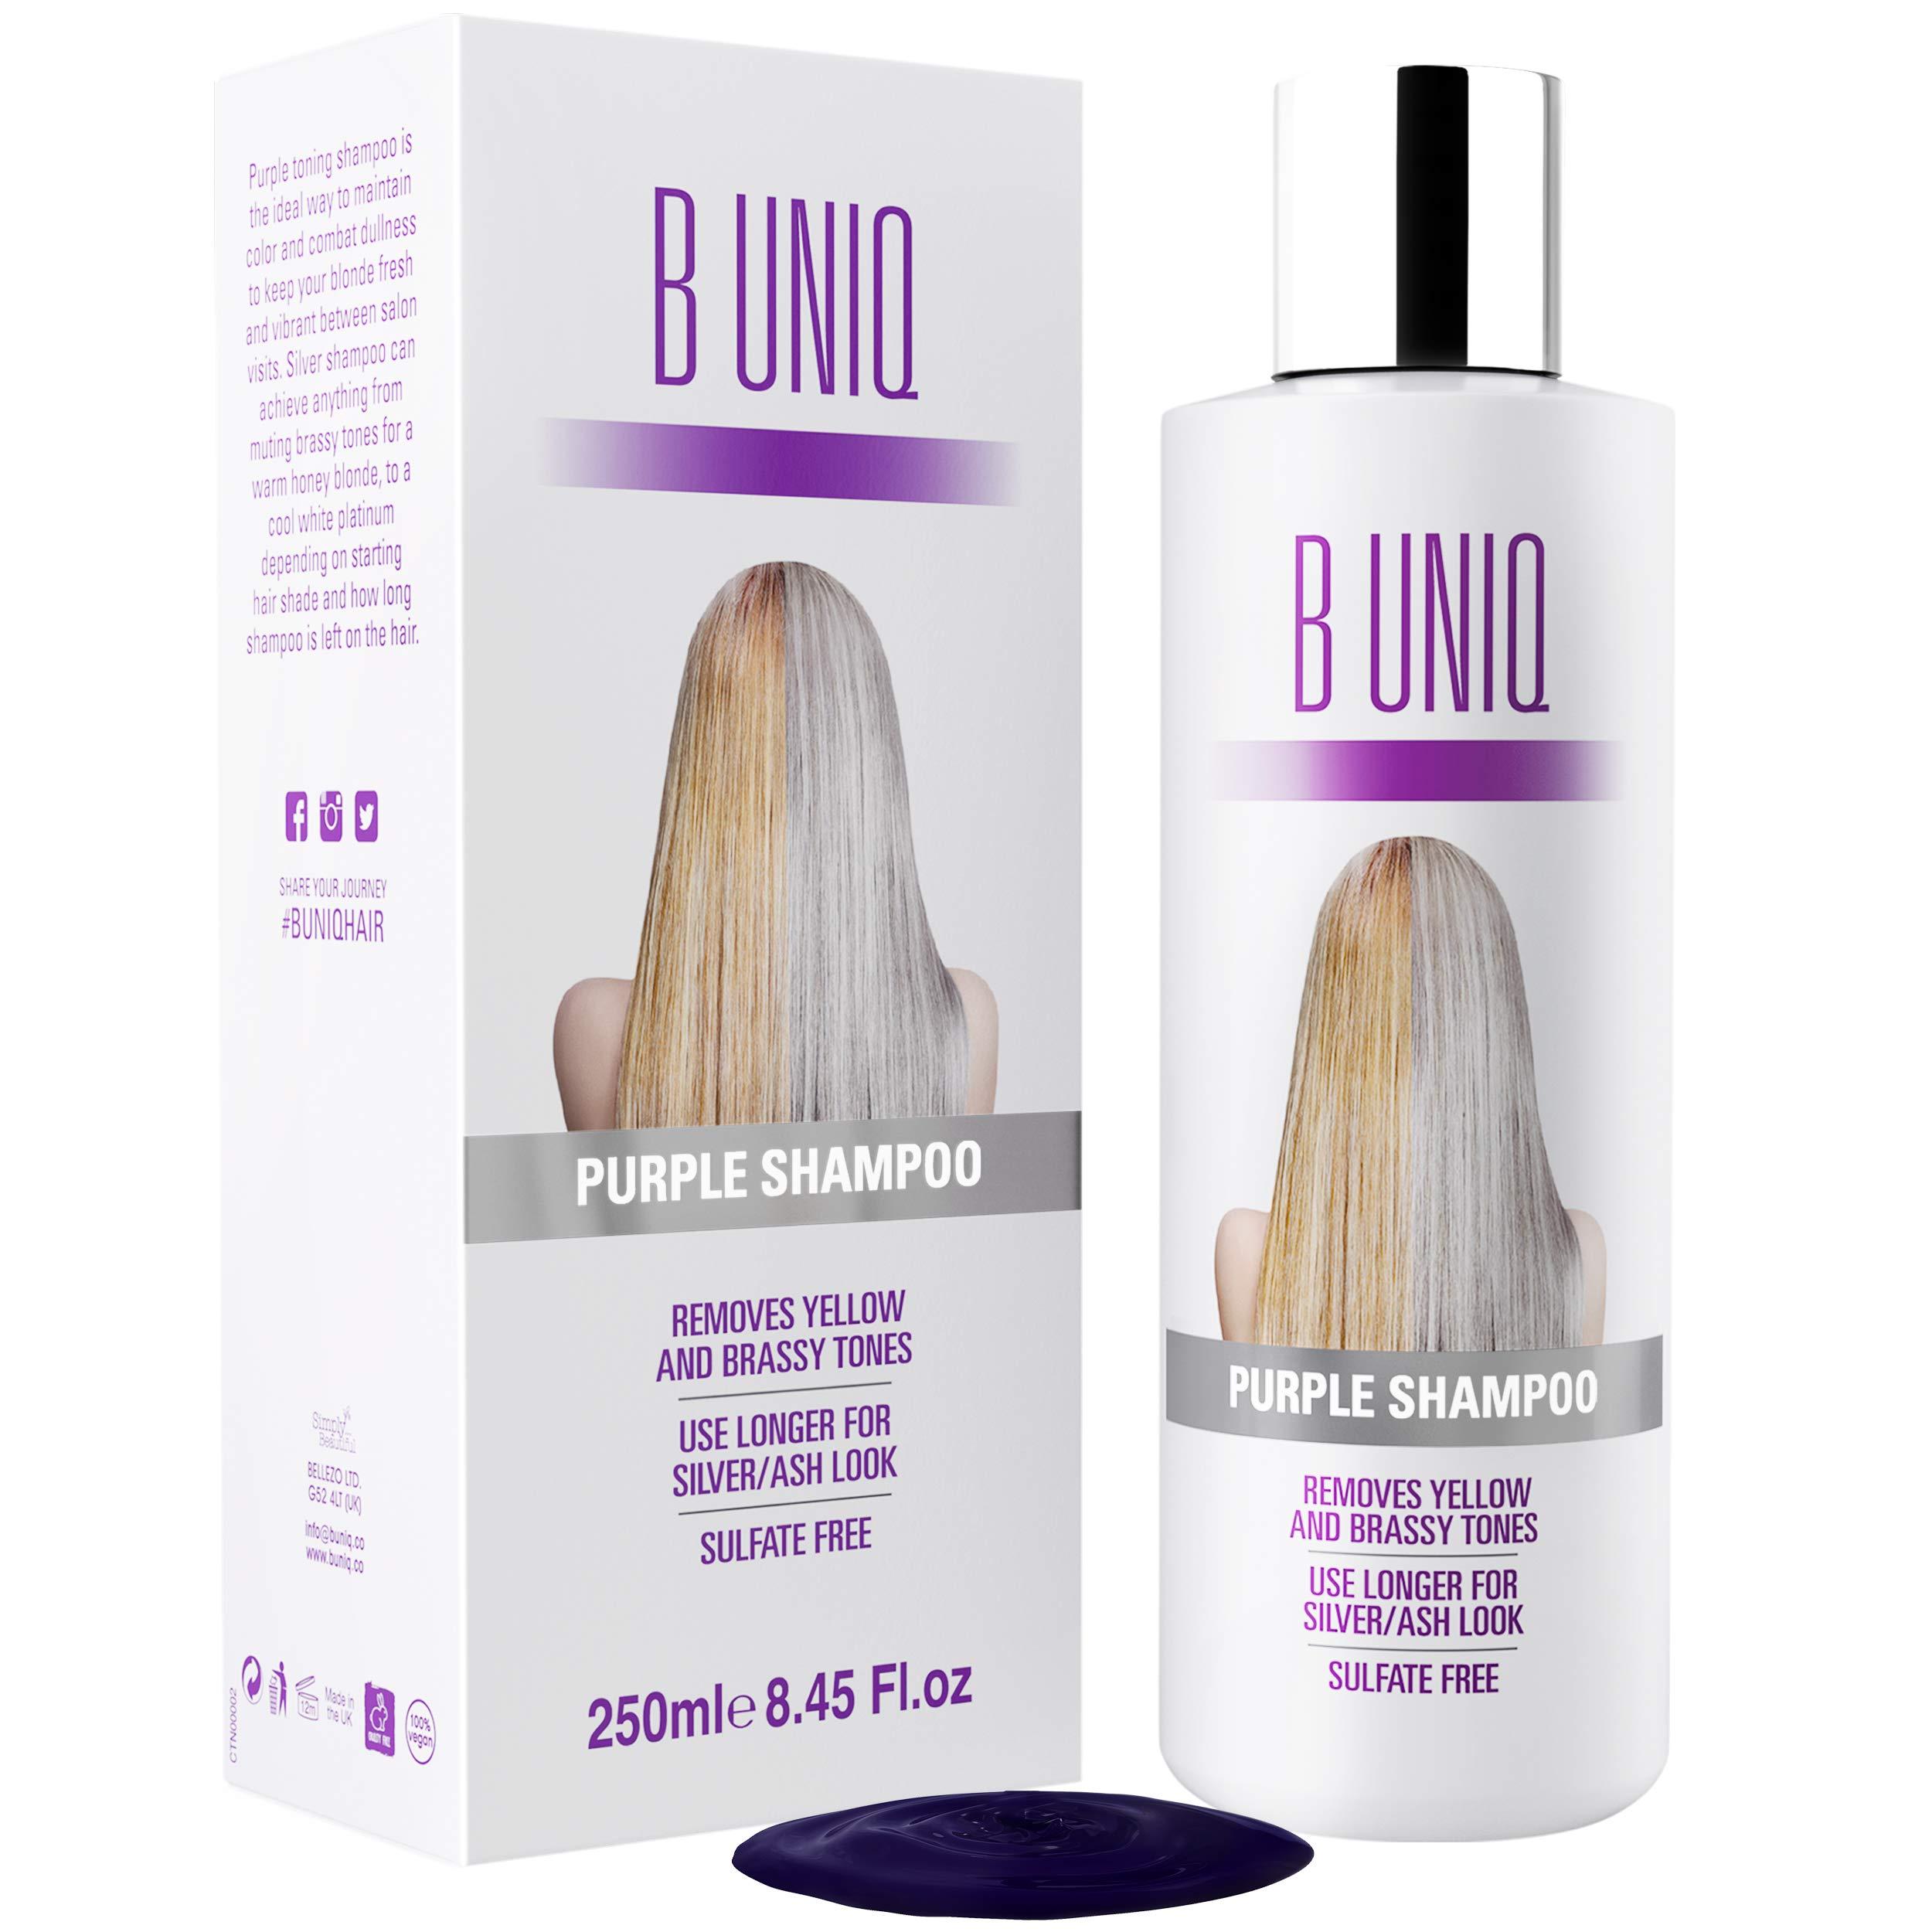 Purple Shampoo Uniq Revitalize Highlighted